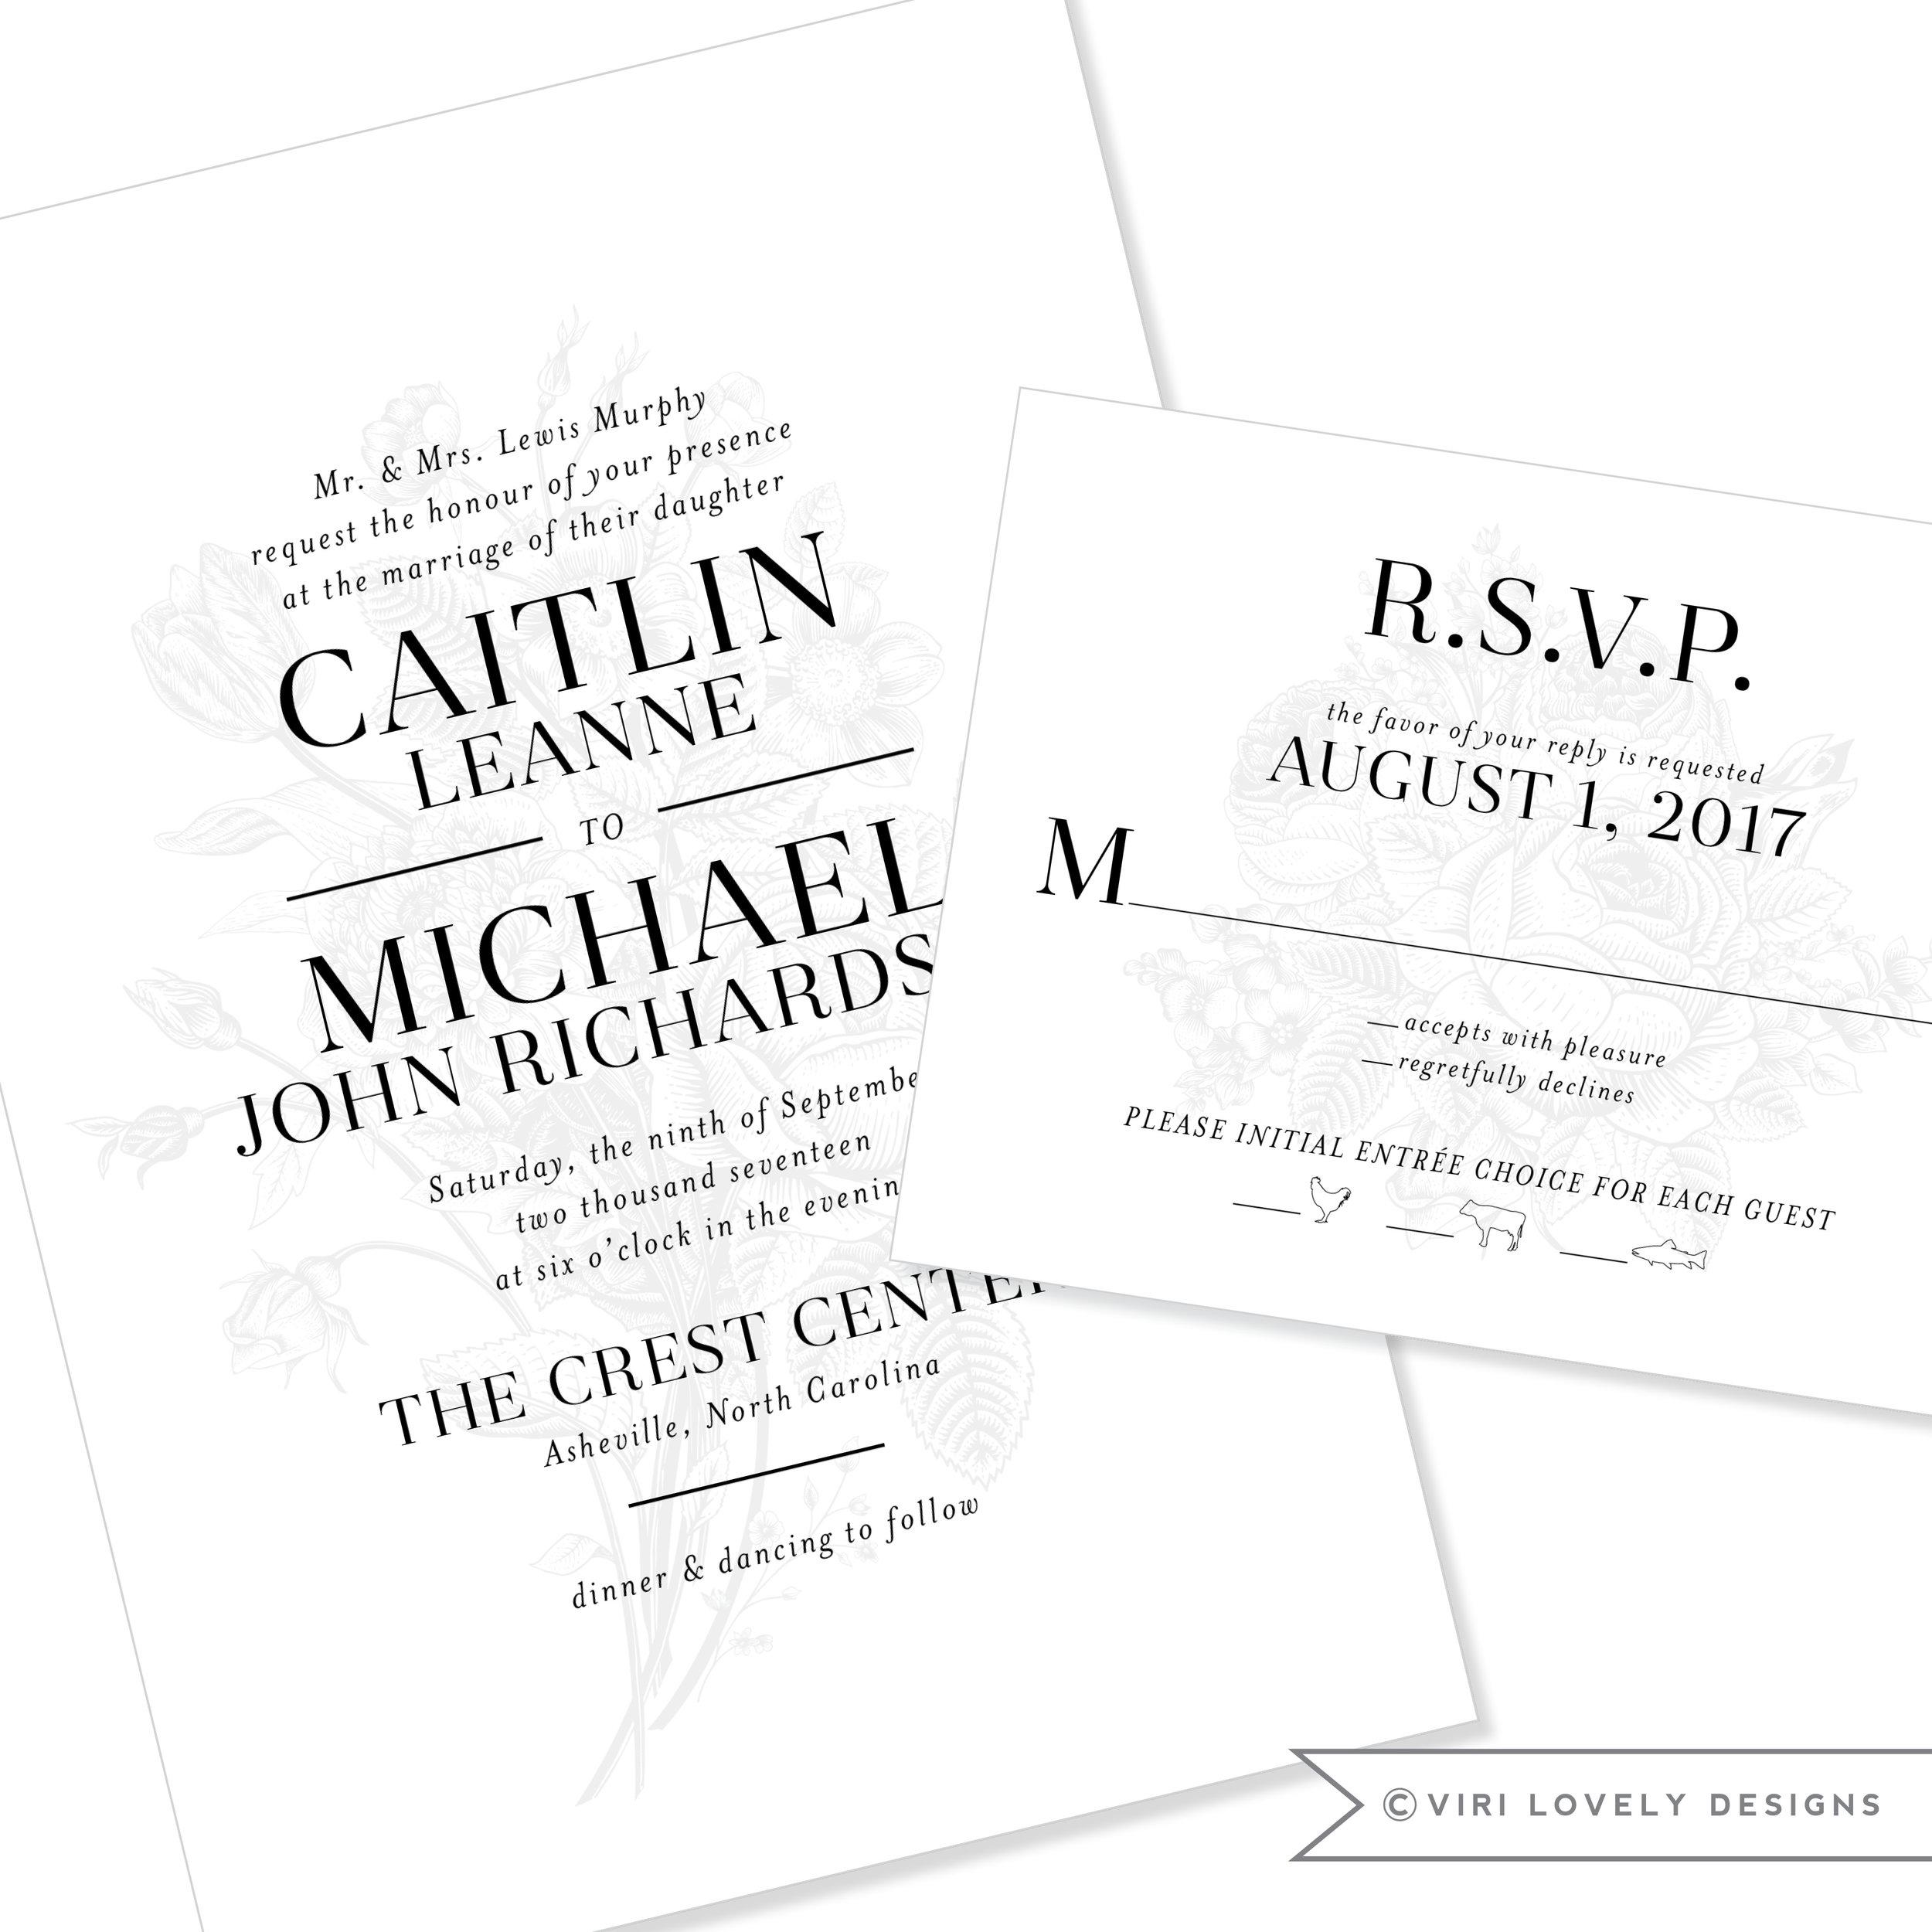 Captivating Viri Lovely Designs | Custom Wedding Invitations | Event Invitations |  Charlotte, North Carolina